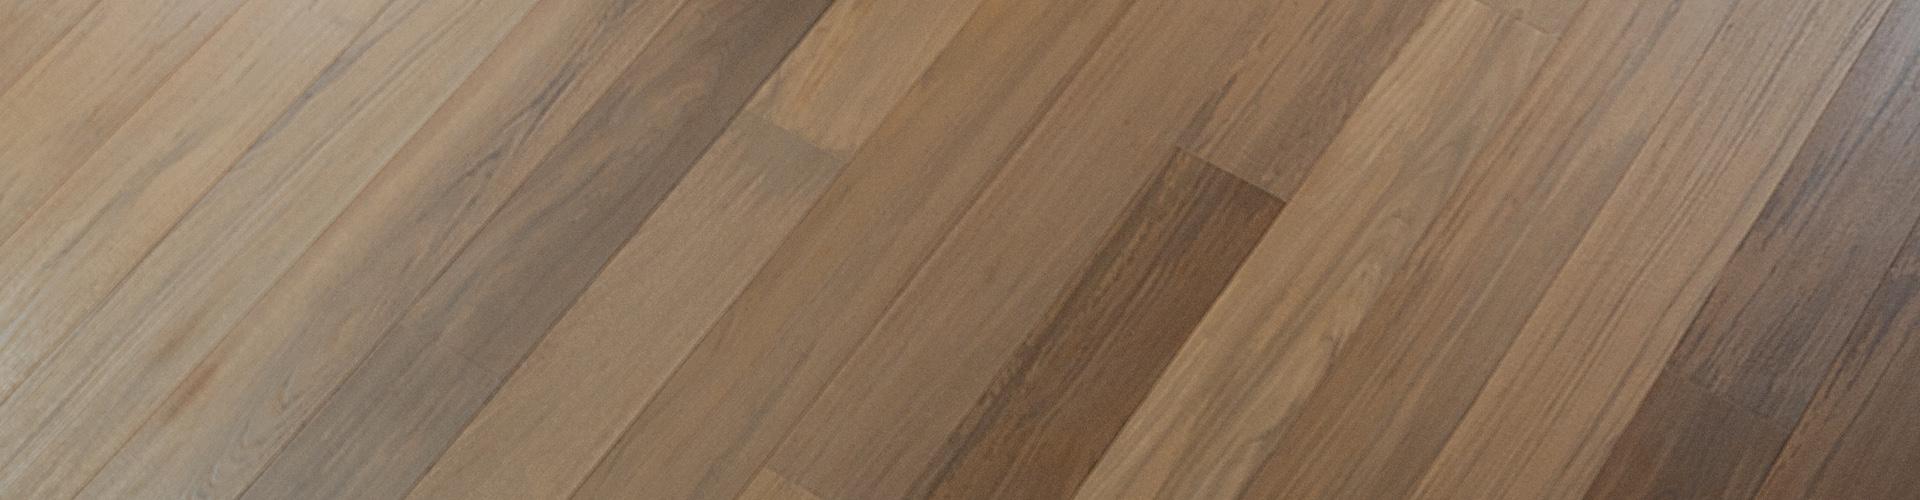 Pavimenti in legno di Teak  Garbelotto